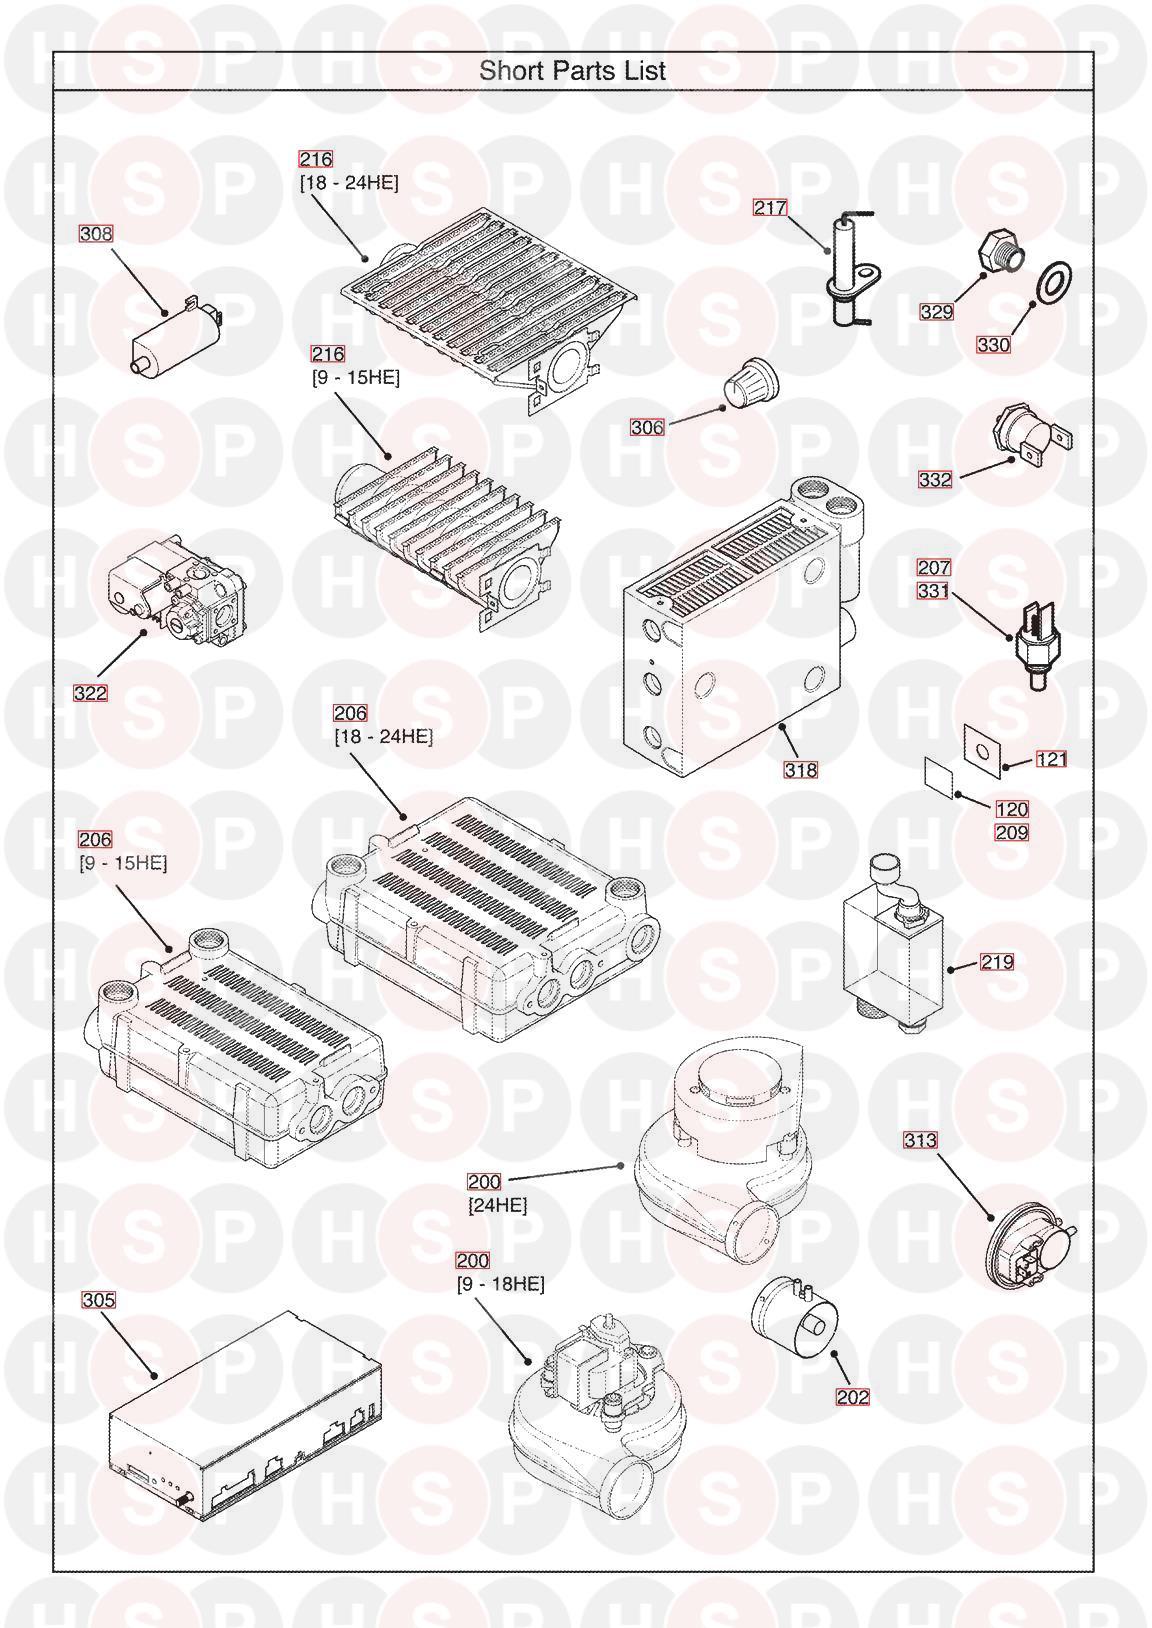 main 24 he heat only appliance diagram  short parts list